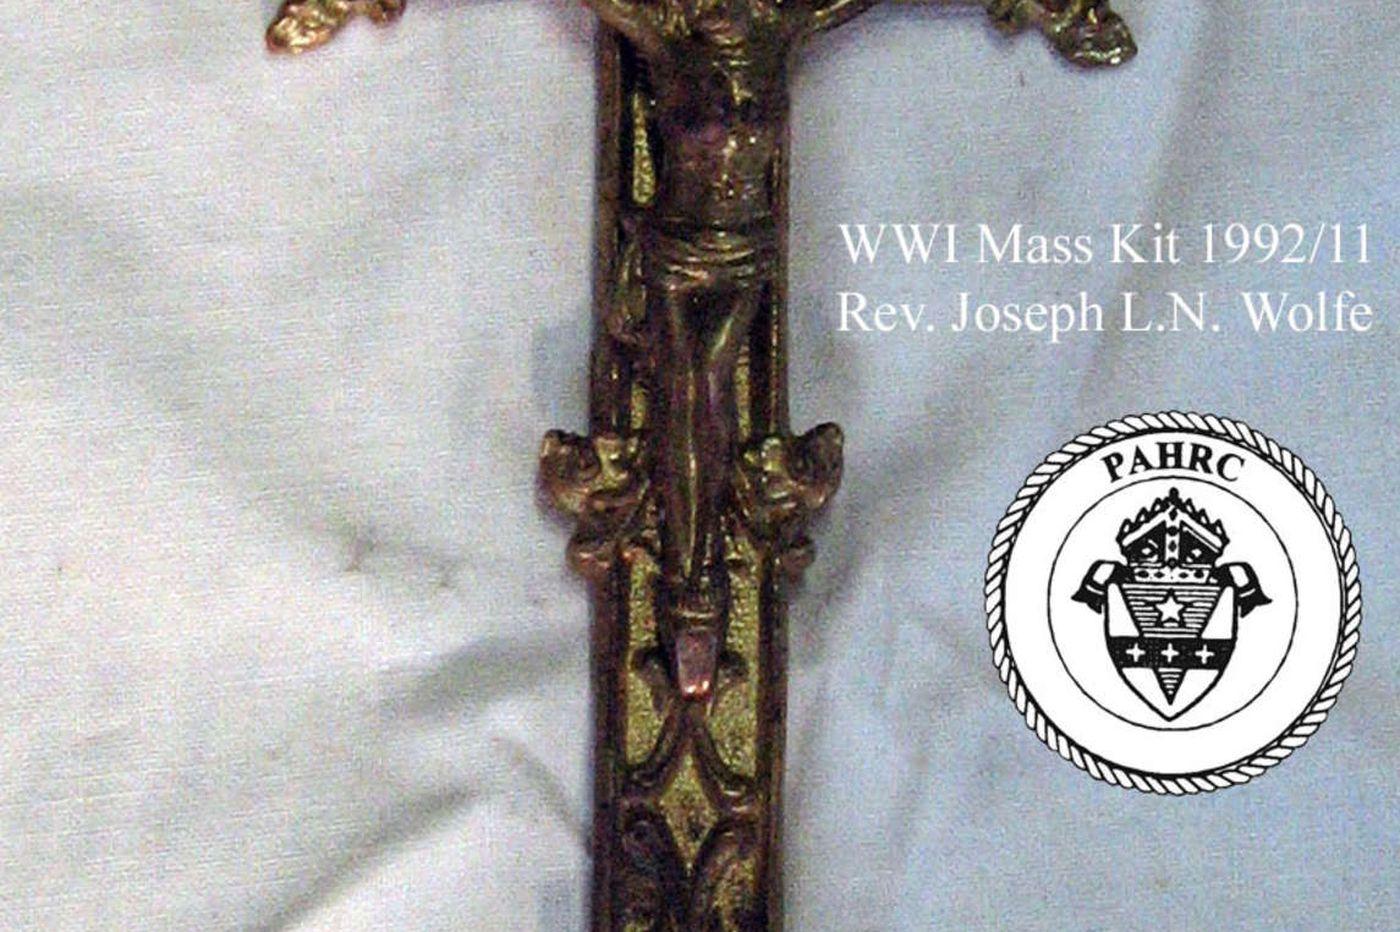 A Phila. chaplain's heroic WWI acts